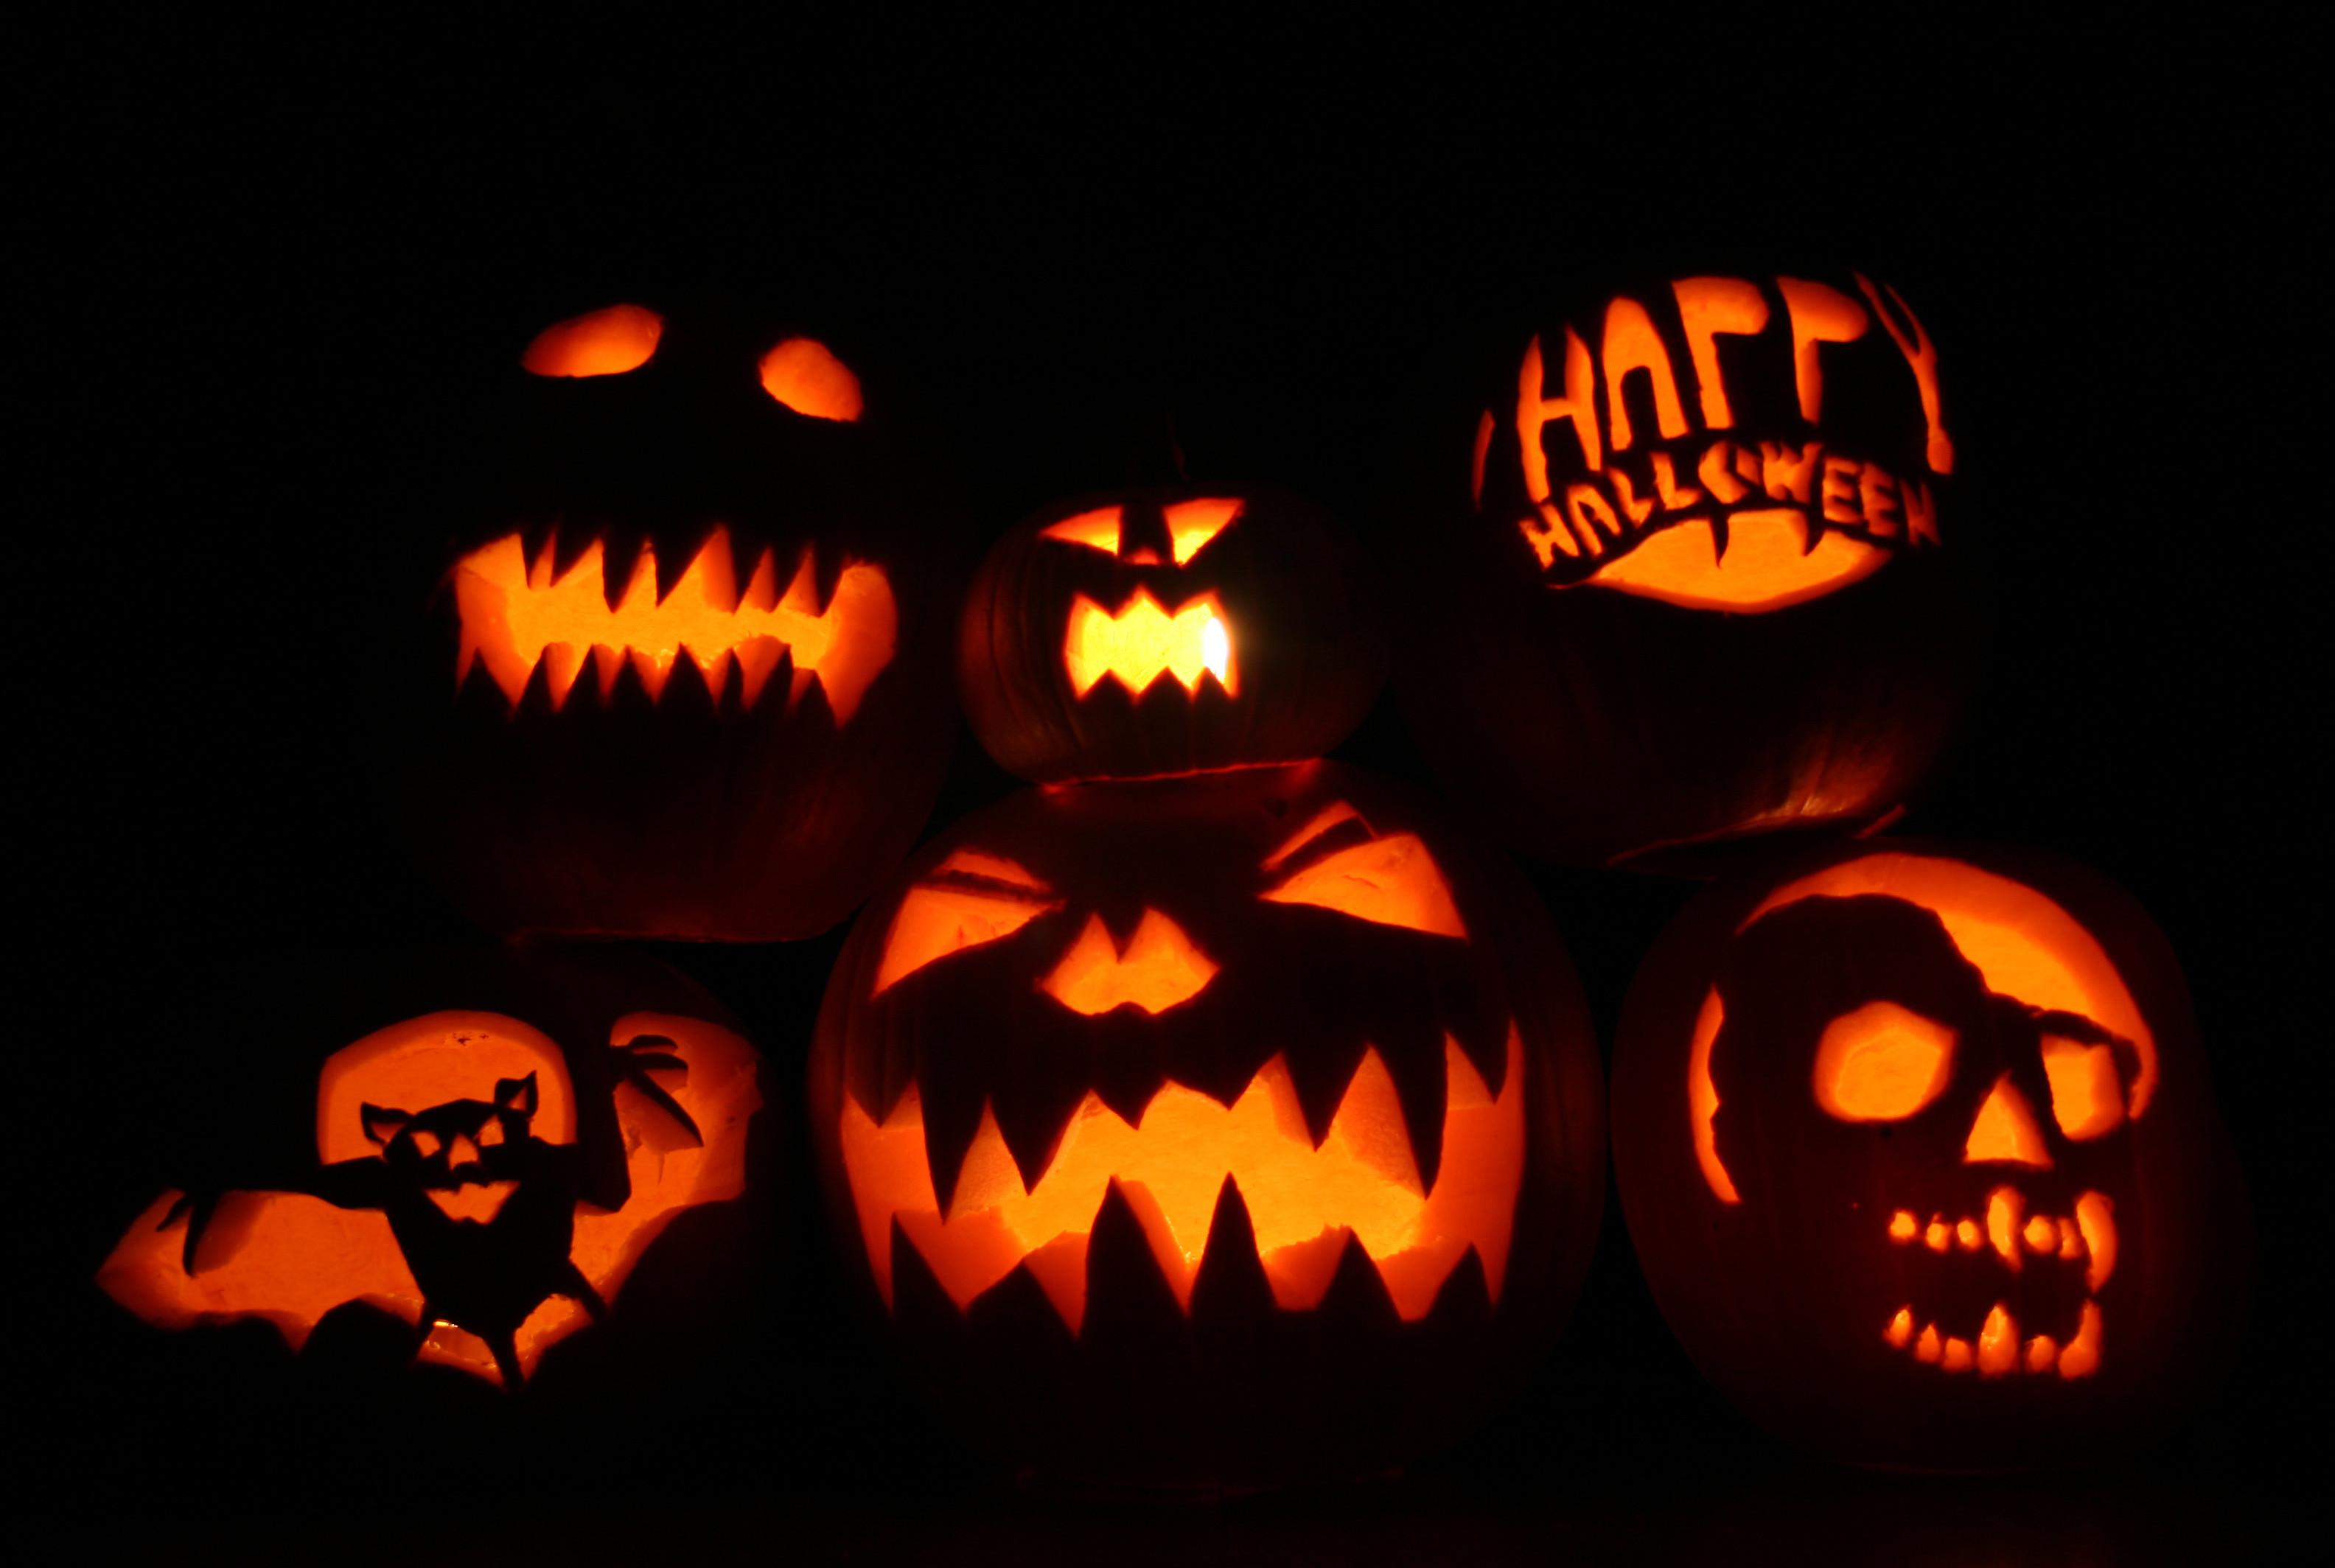 wallpaper.wiki-Dark-Halloween-Pumpkin-HD-Wallpapers-PIC-